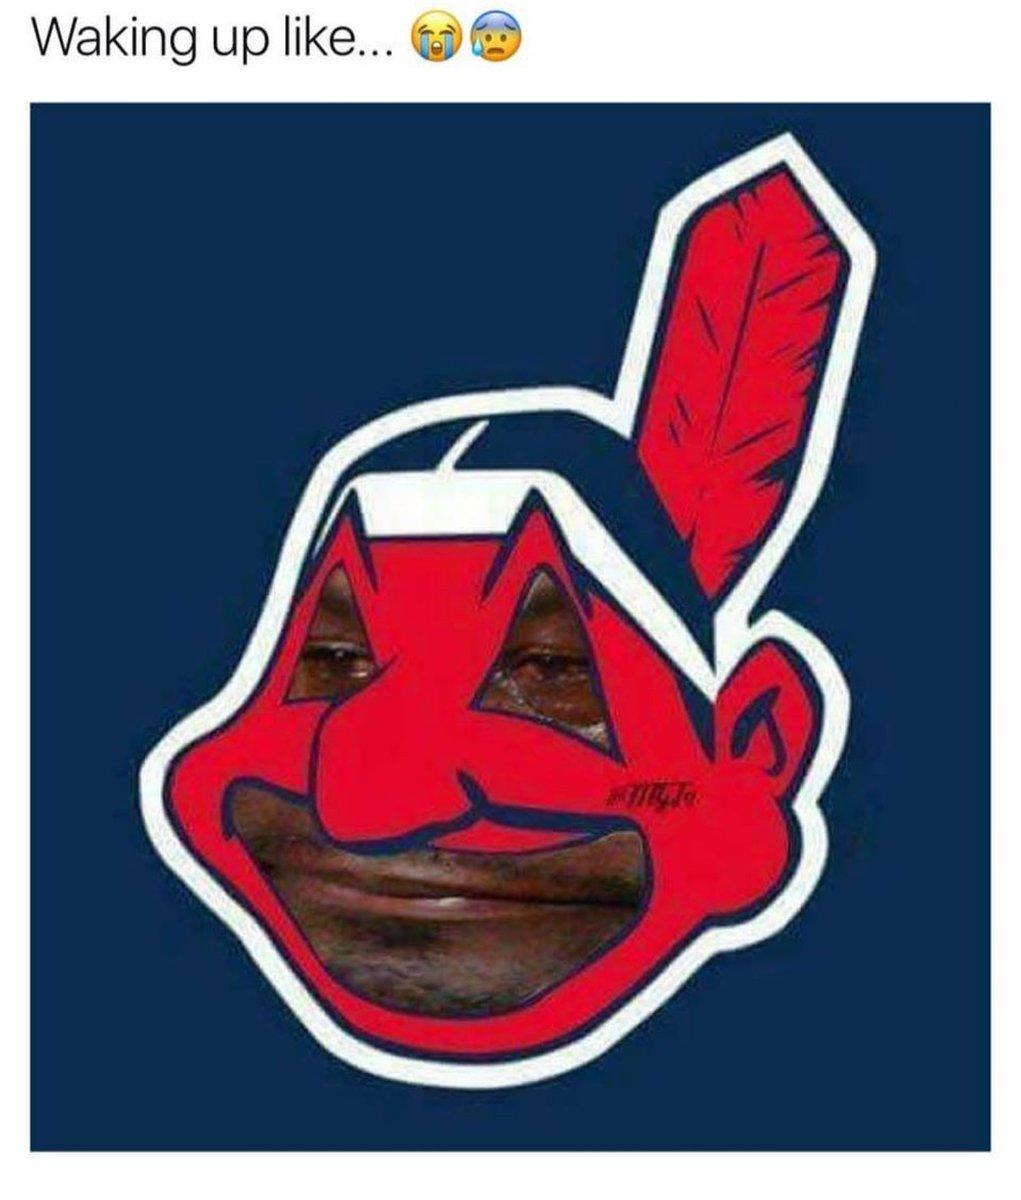 Cleveland Indians fans   Like/Retweet gain #iddrive #TrapaDrive #GainWithXtianDela #GainSquad #IFB #follo4follo #follow #Yankees<br>http://pic.twitter.com/MsUcmb1JiU